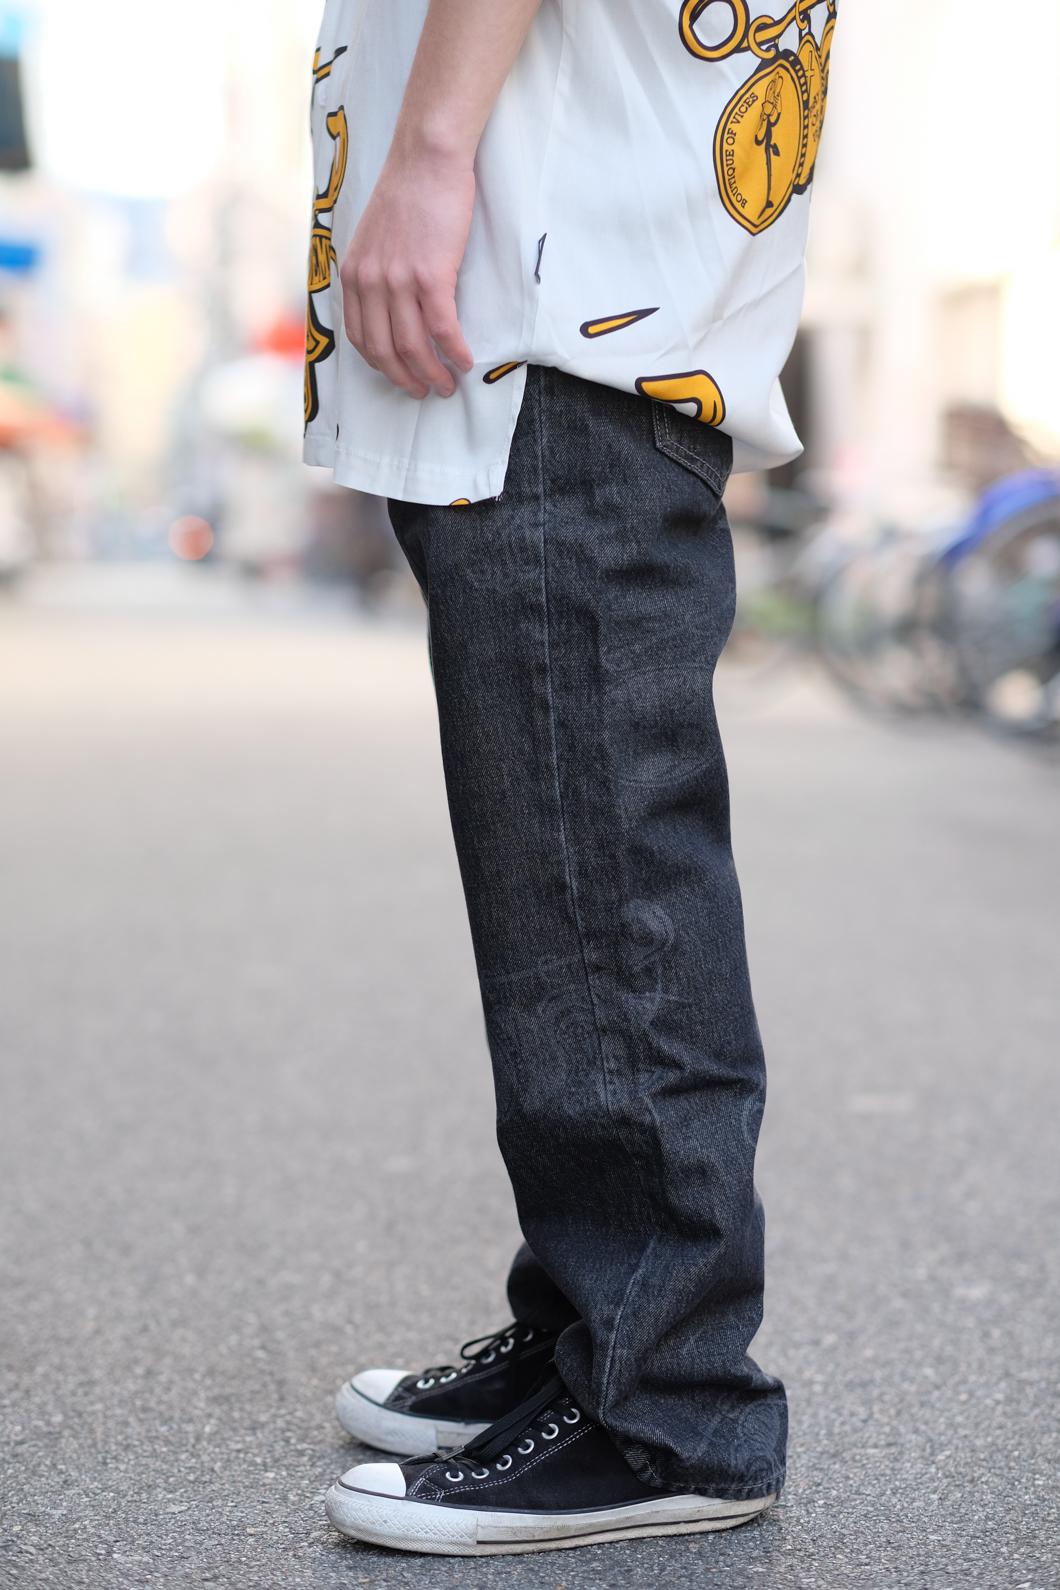 【PAS DE MER/パドゥメ】MEDALS PANTS パンツ / BLACK